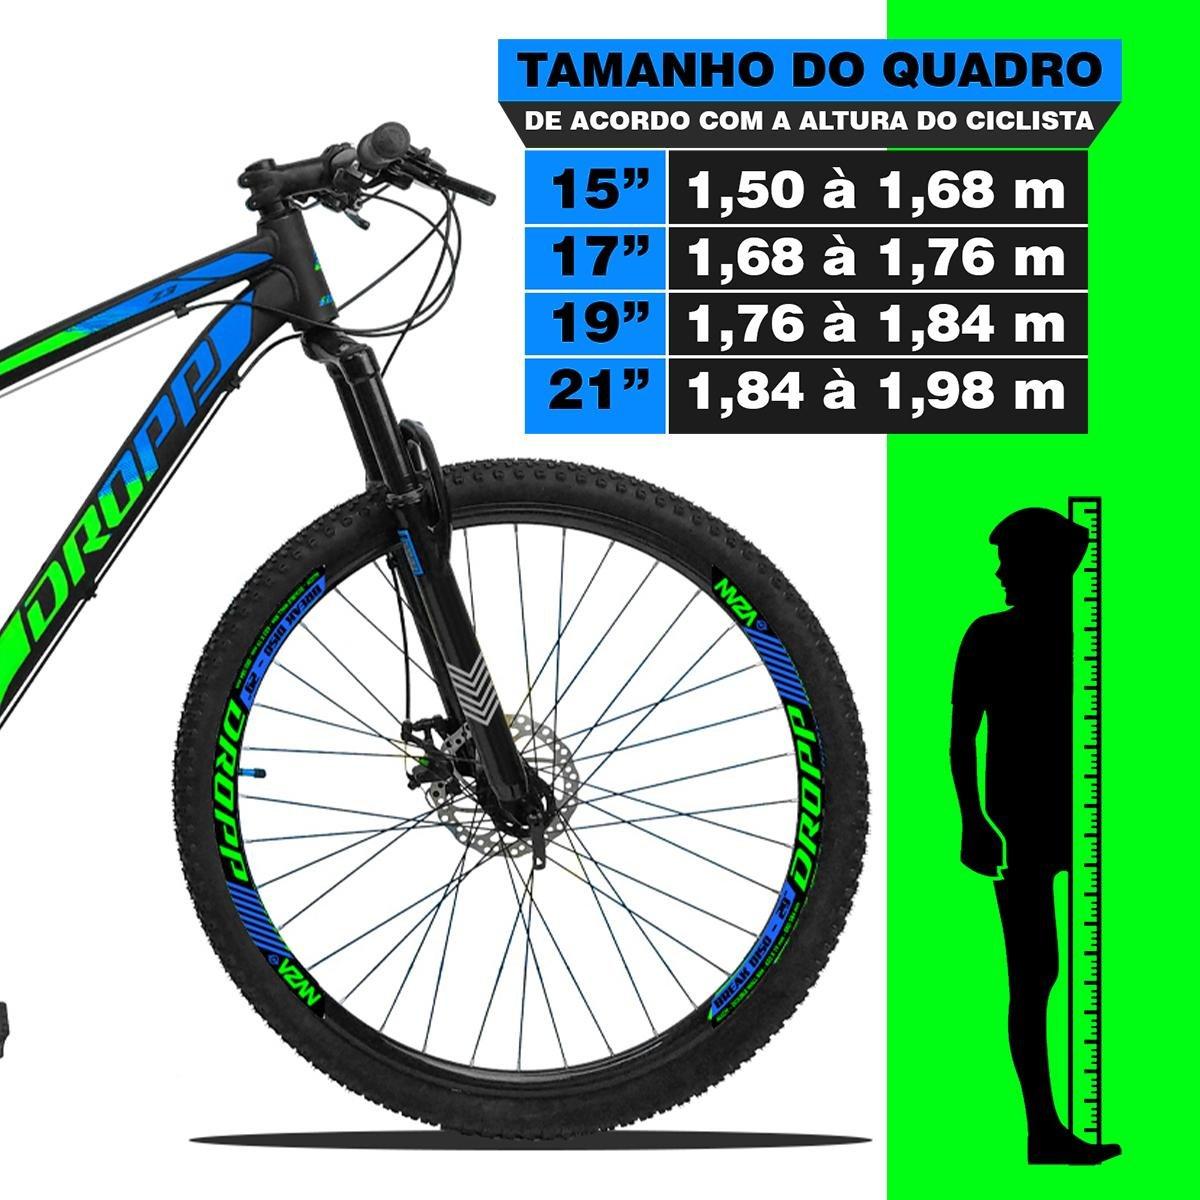 BICICLETA ARO 29 DROPP Z3  SHIMANO 21V FREIO A DISCO VERDE/AZUL